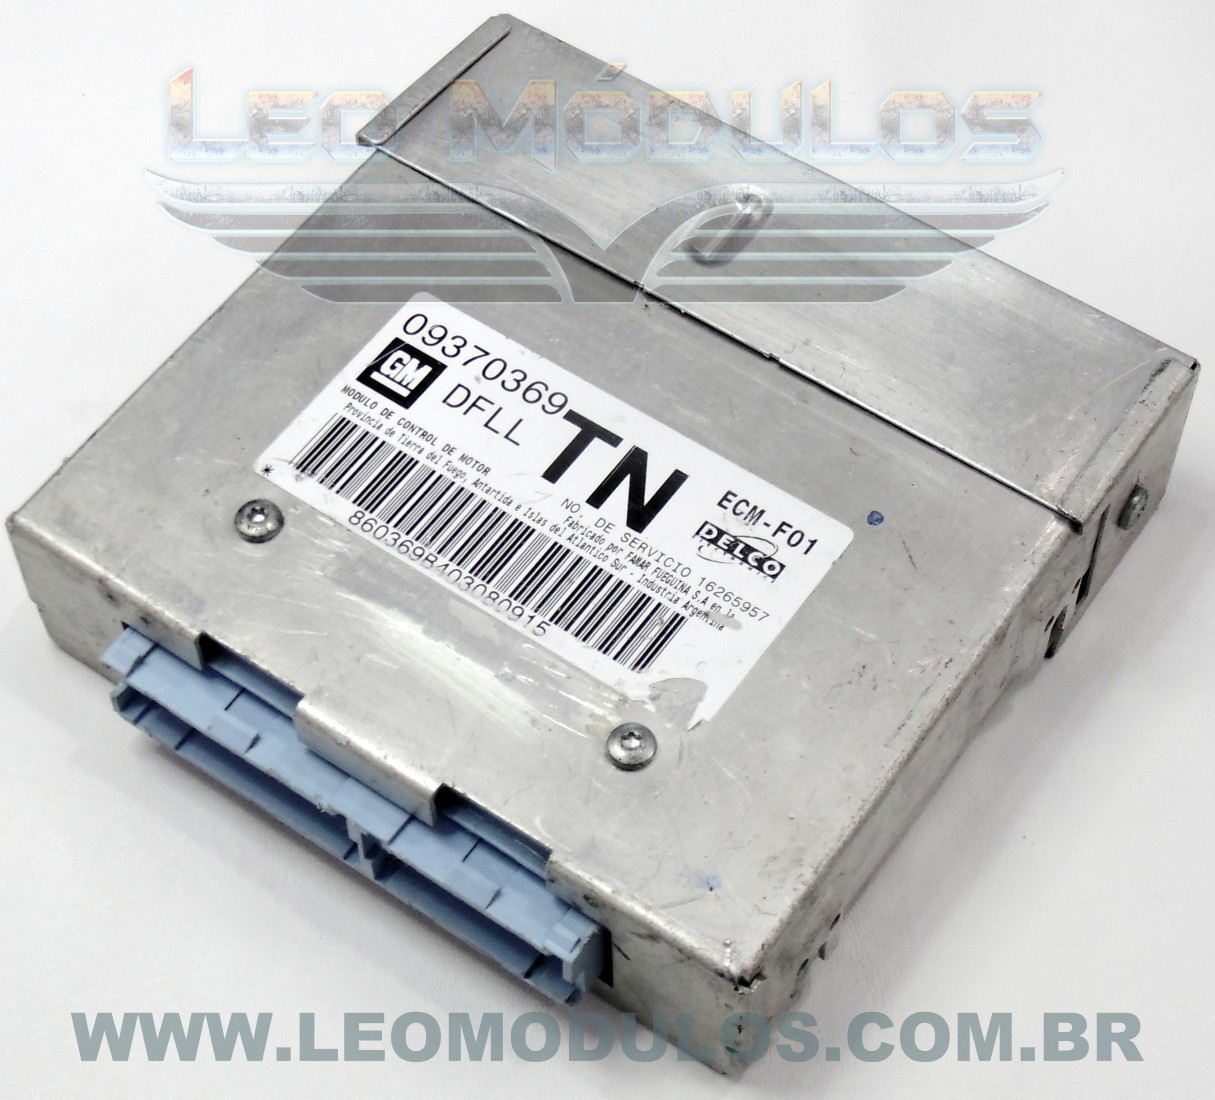 Módulo de injeção multec - DFLL TN 09370369 16265957 - Chevrolet Corsa MPFI 1.0 8V Álcool - DFLL TN - Leo Módulos